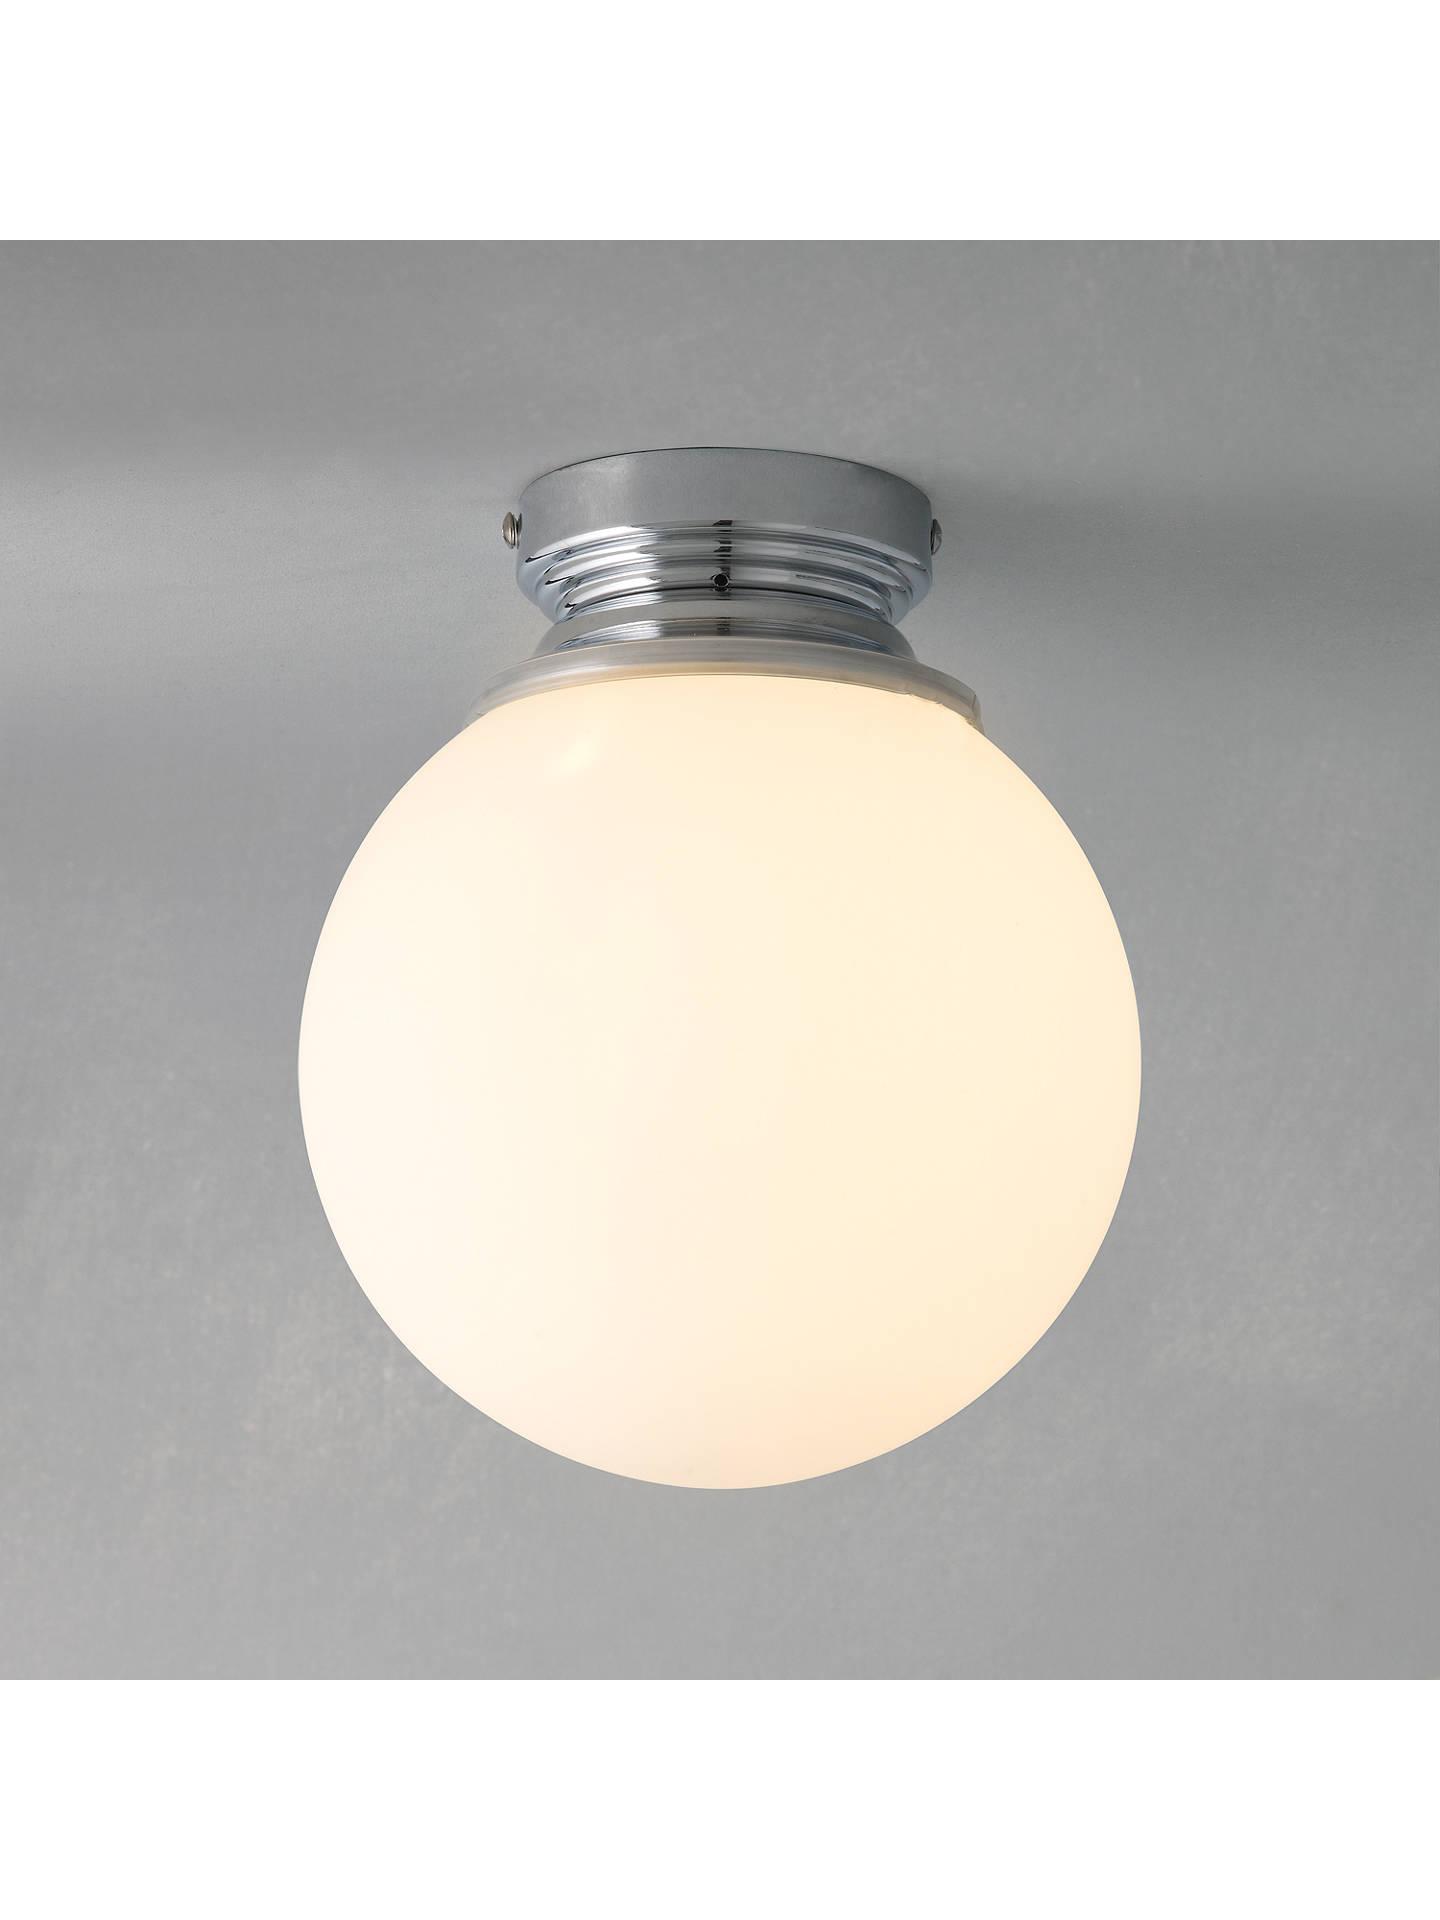 low priced ee625 f4909 John Lewis Giles Bathroom Ceiling Light at John Lewis & Partners